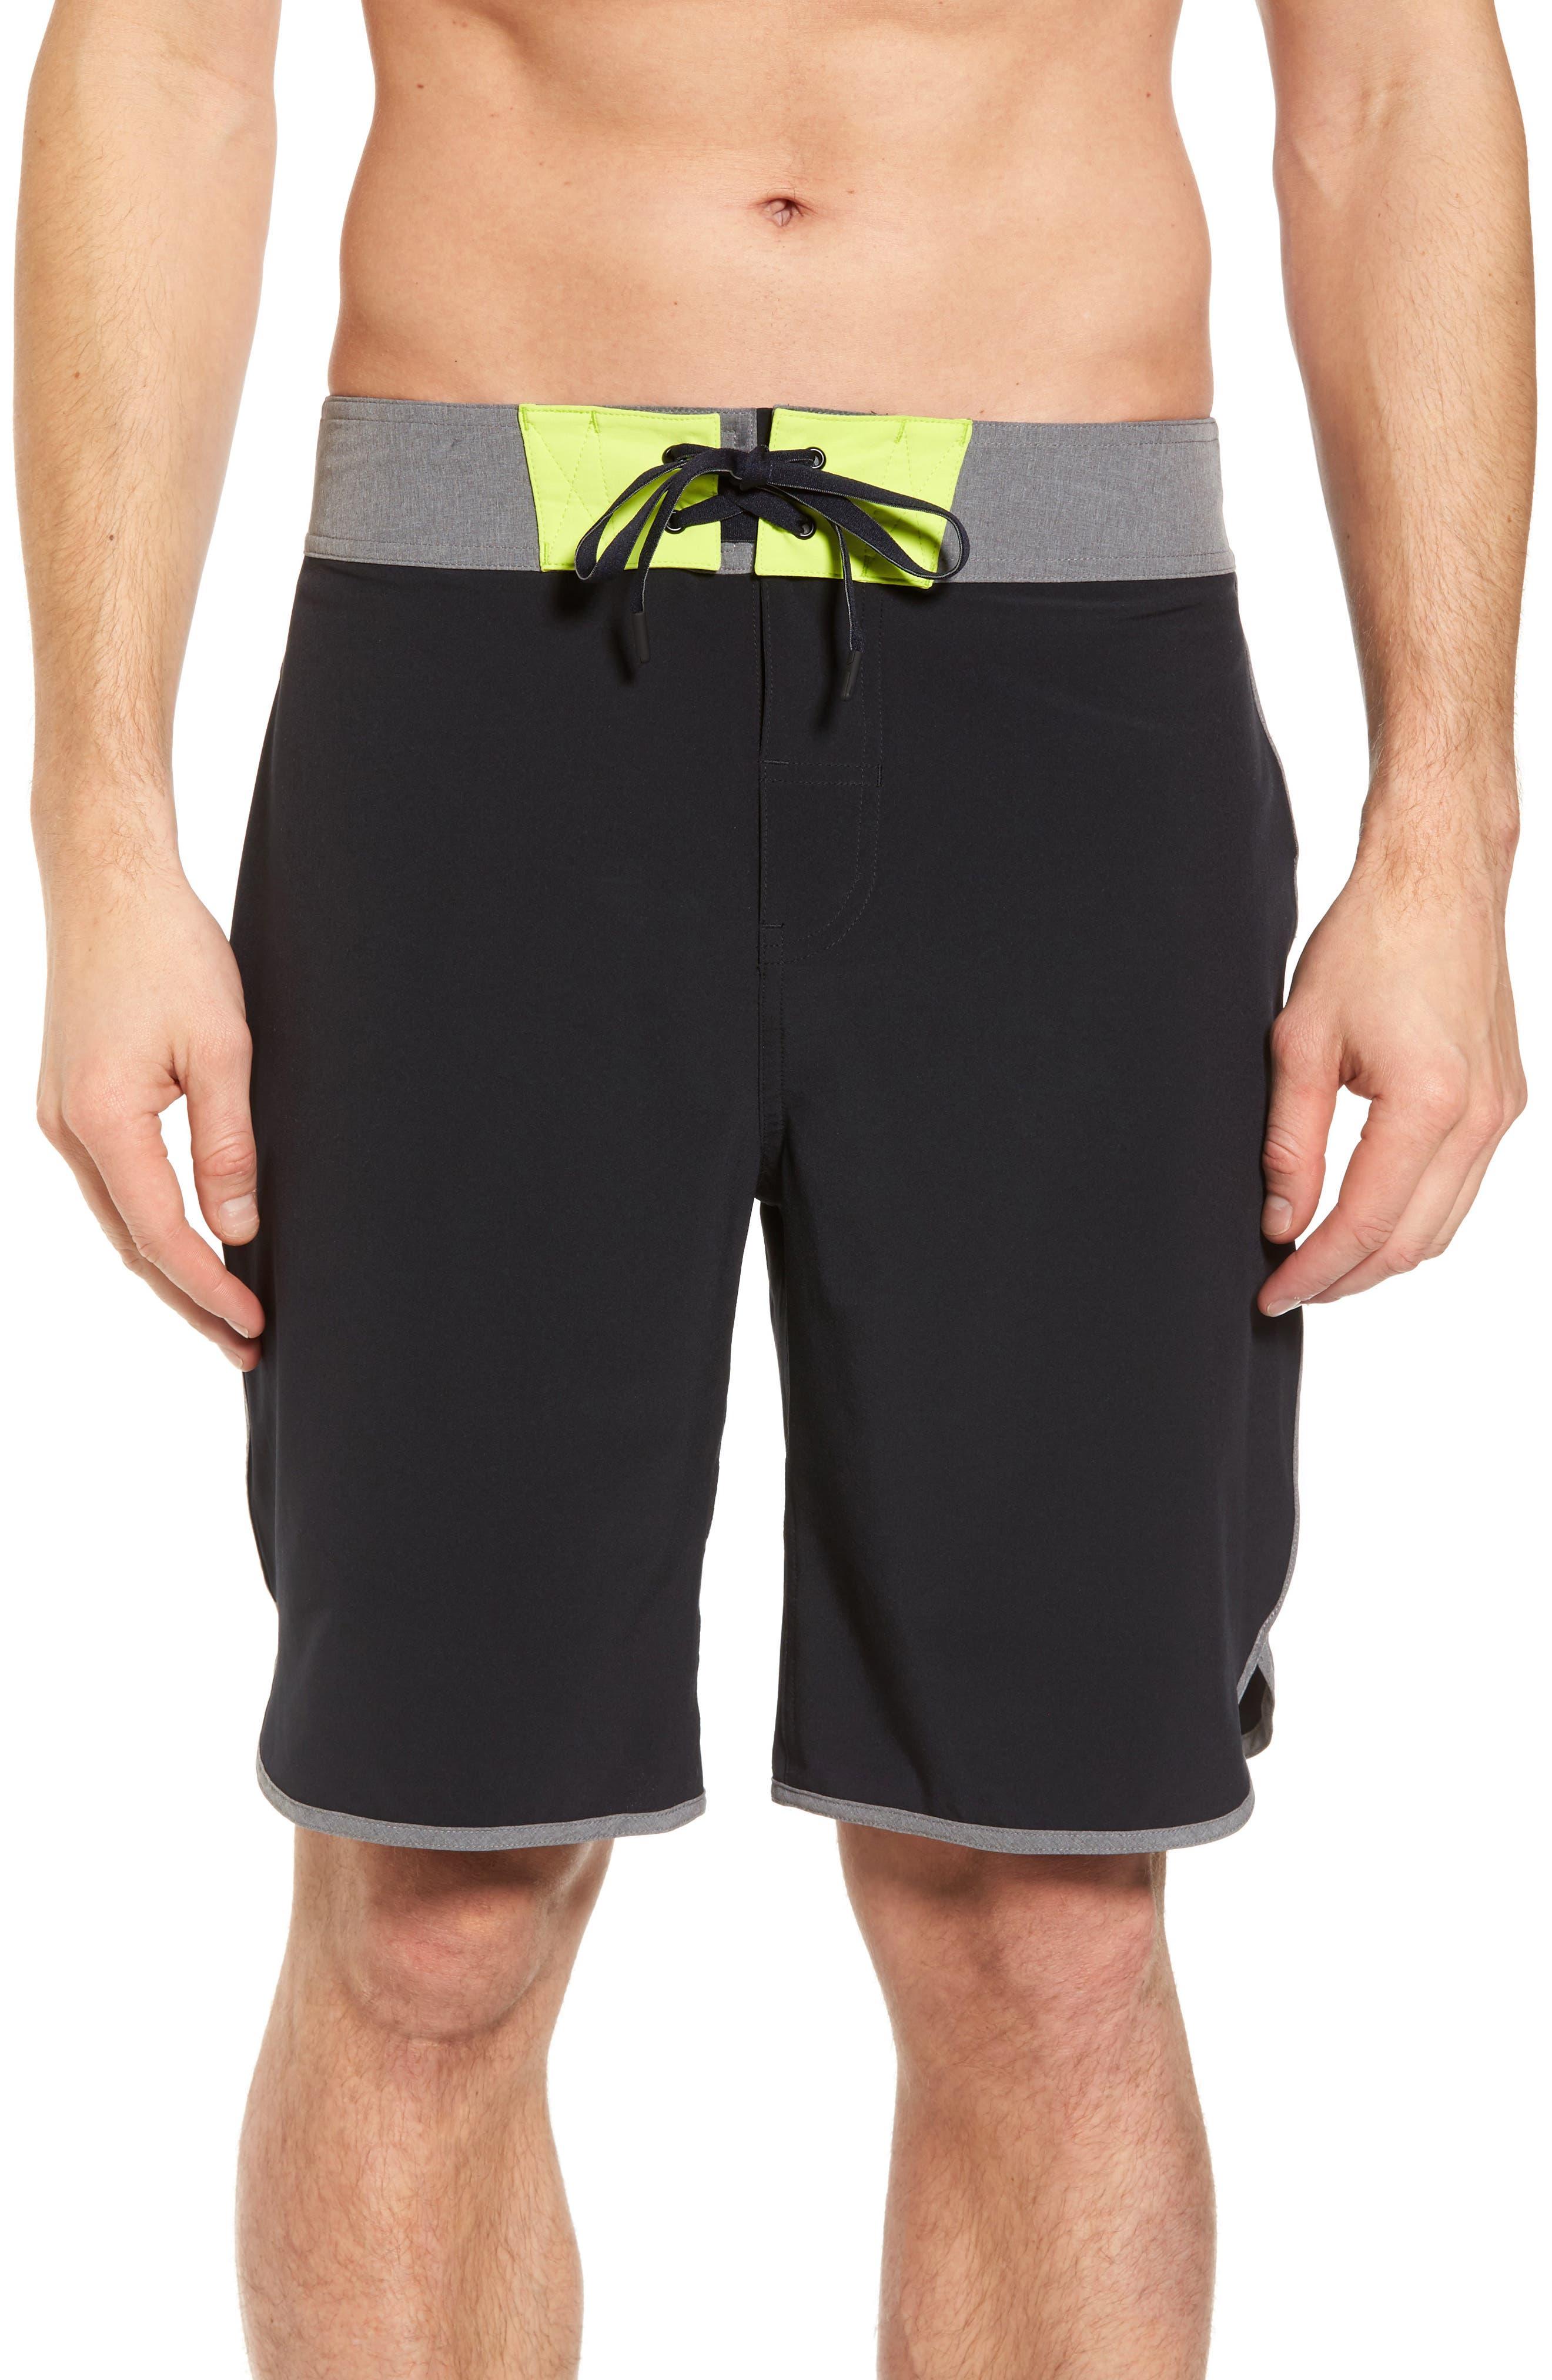 Flex Hybrid Athletic Shorts,                         Main,                         color, Black